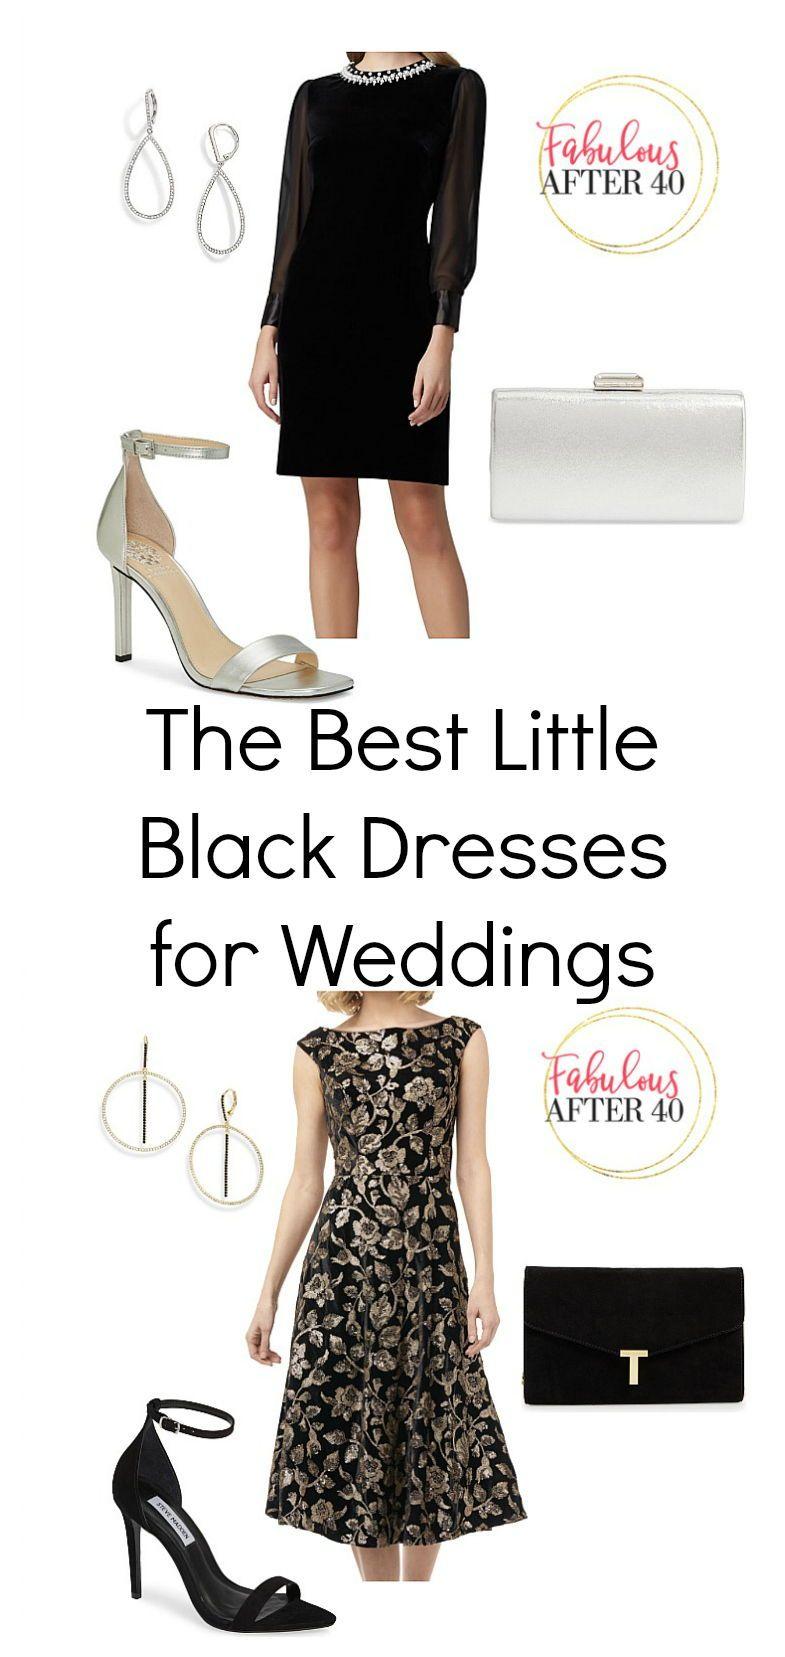 Can You Wear A Black Dress To A Wedding Dresses To Wear To A Wedding Black Dress Perfect Little Black Dress